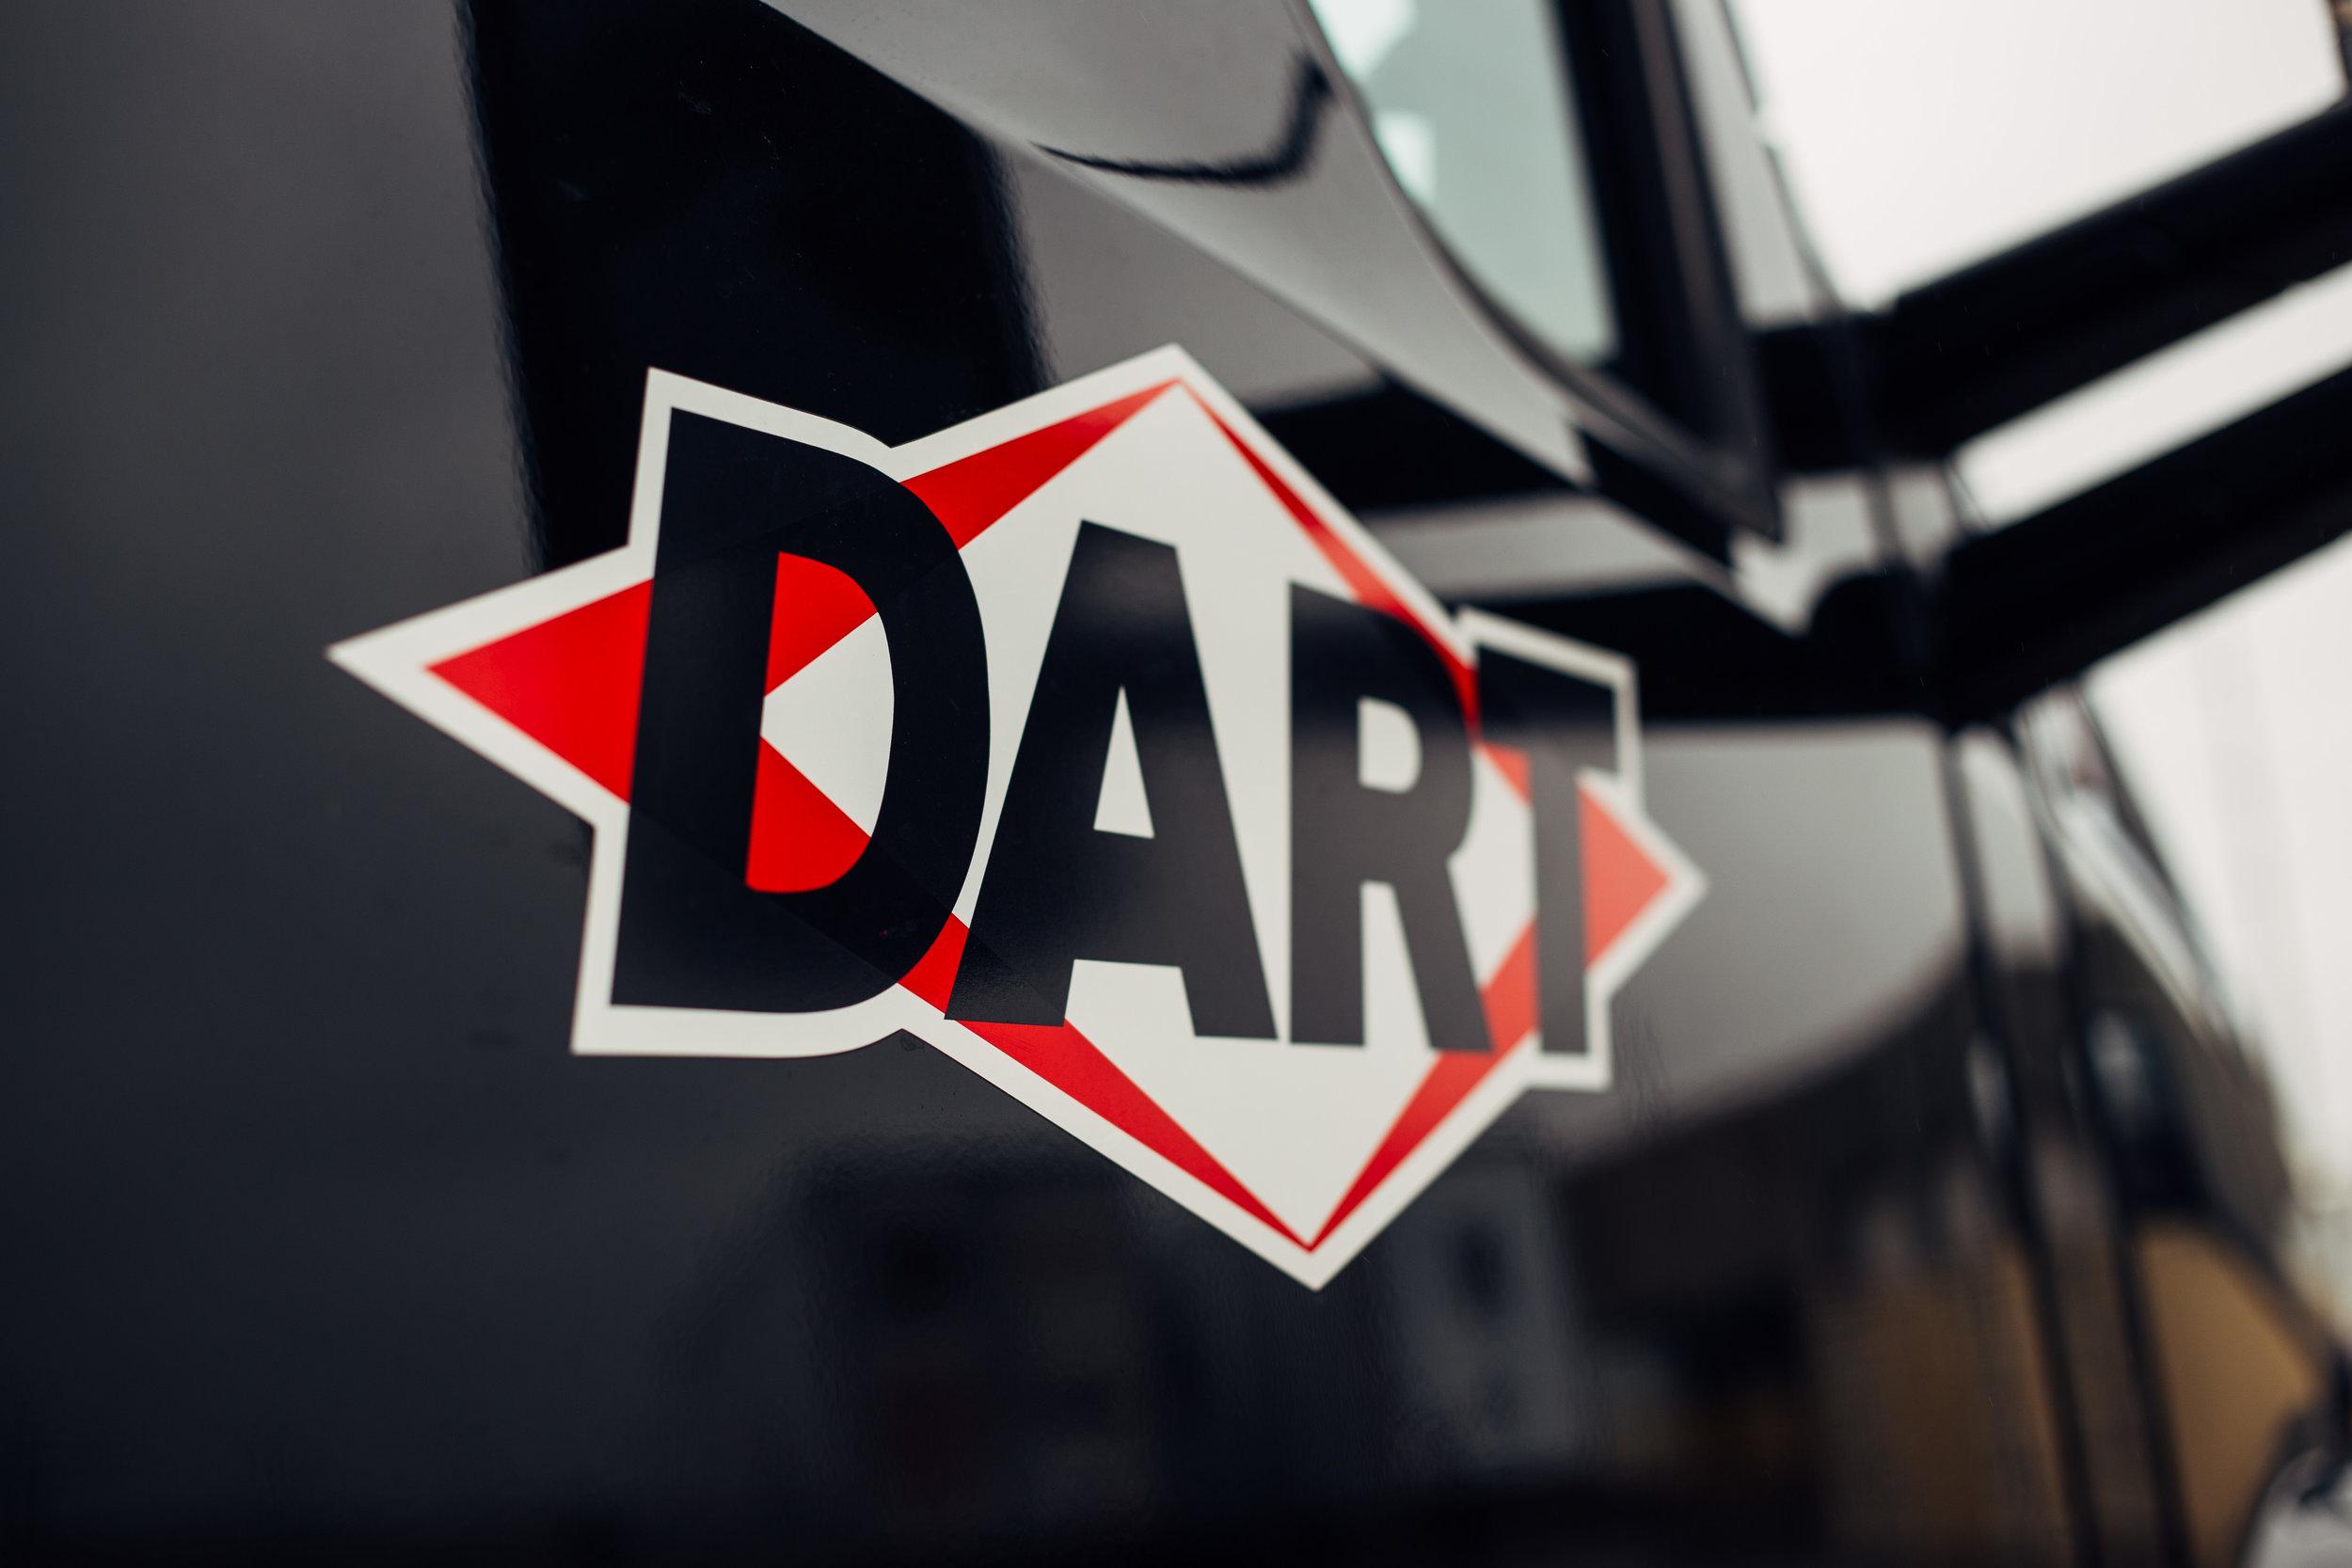 DartTrucking-11.jpg